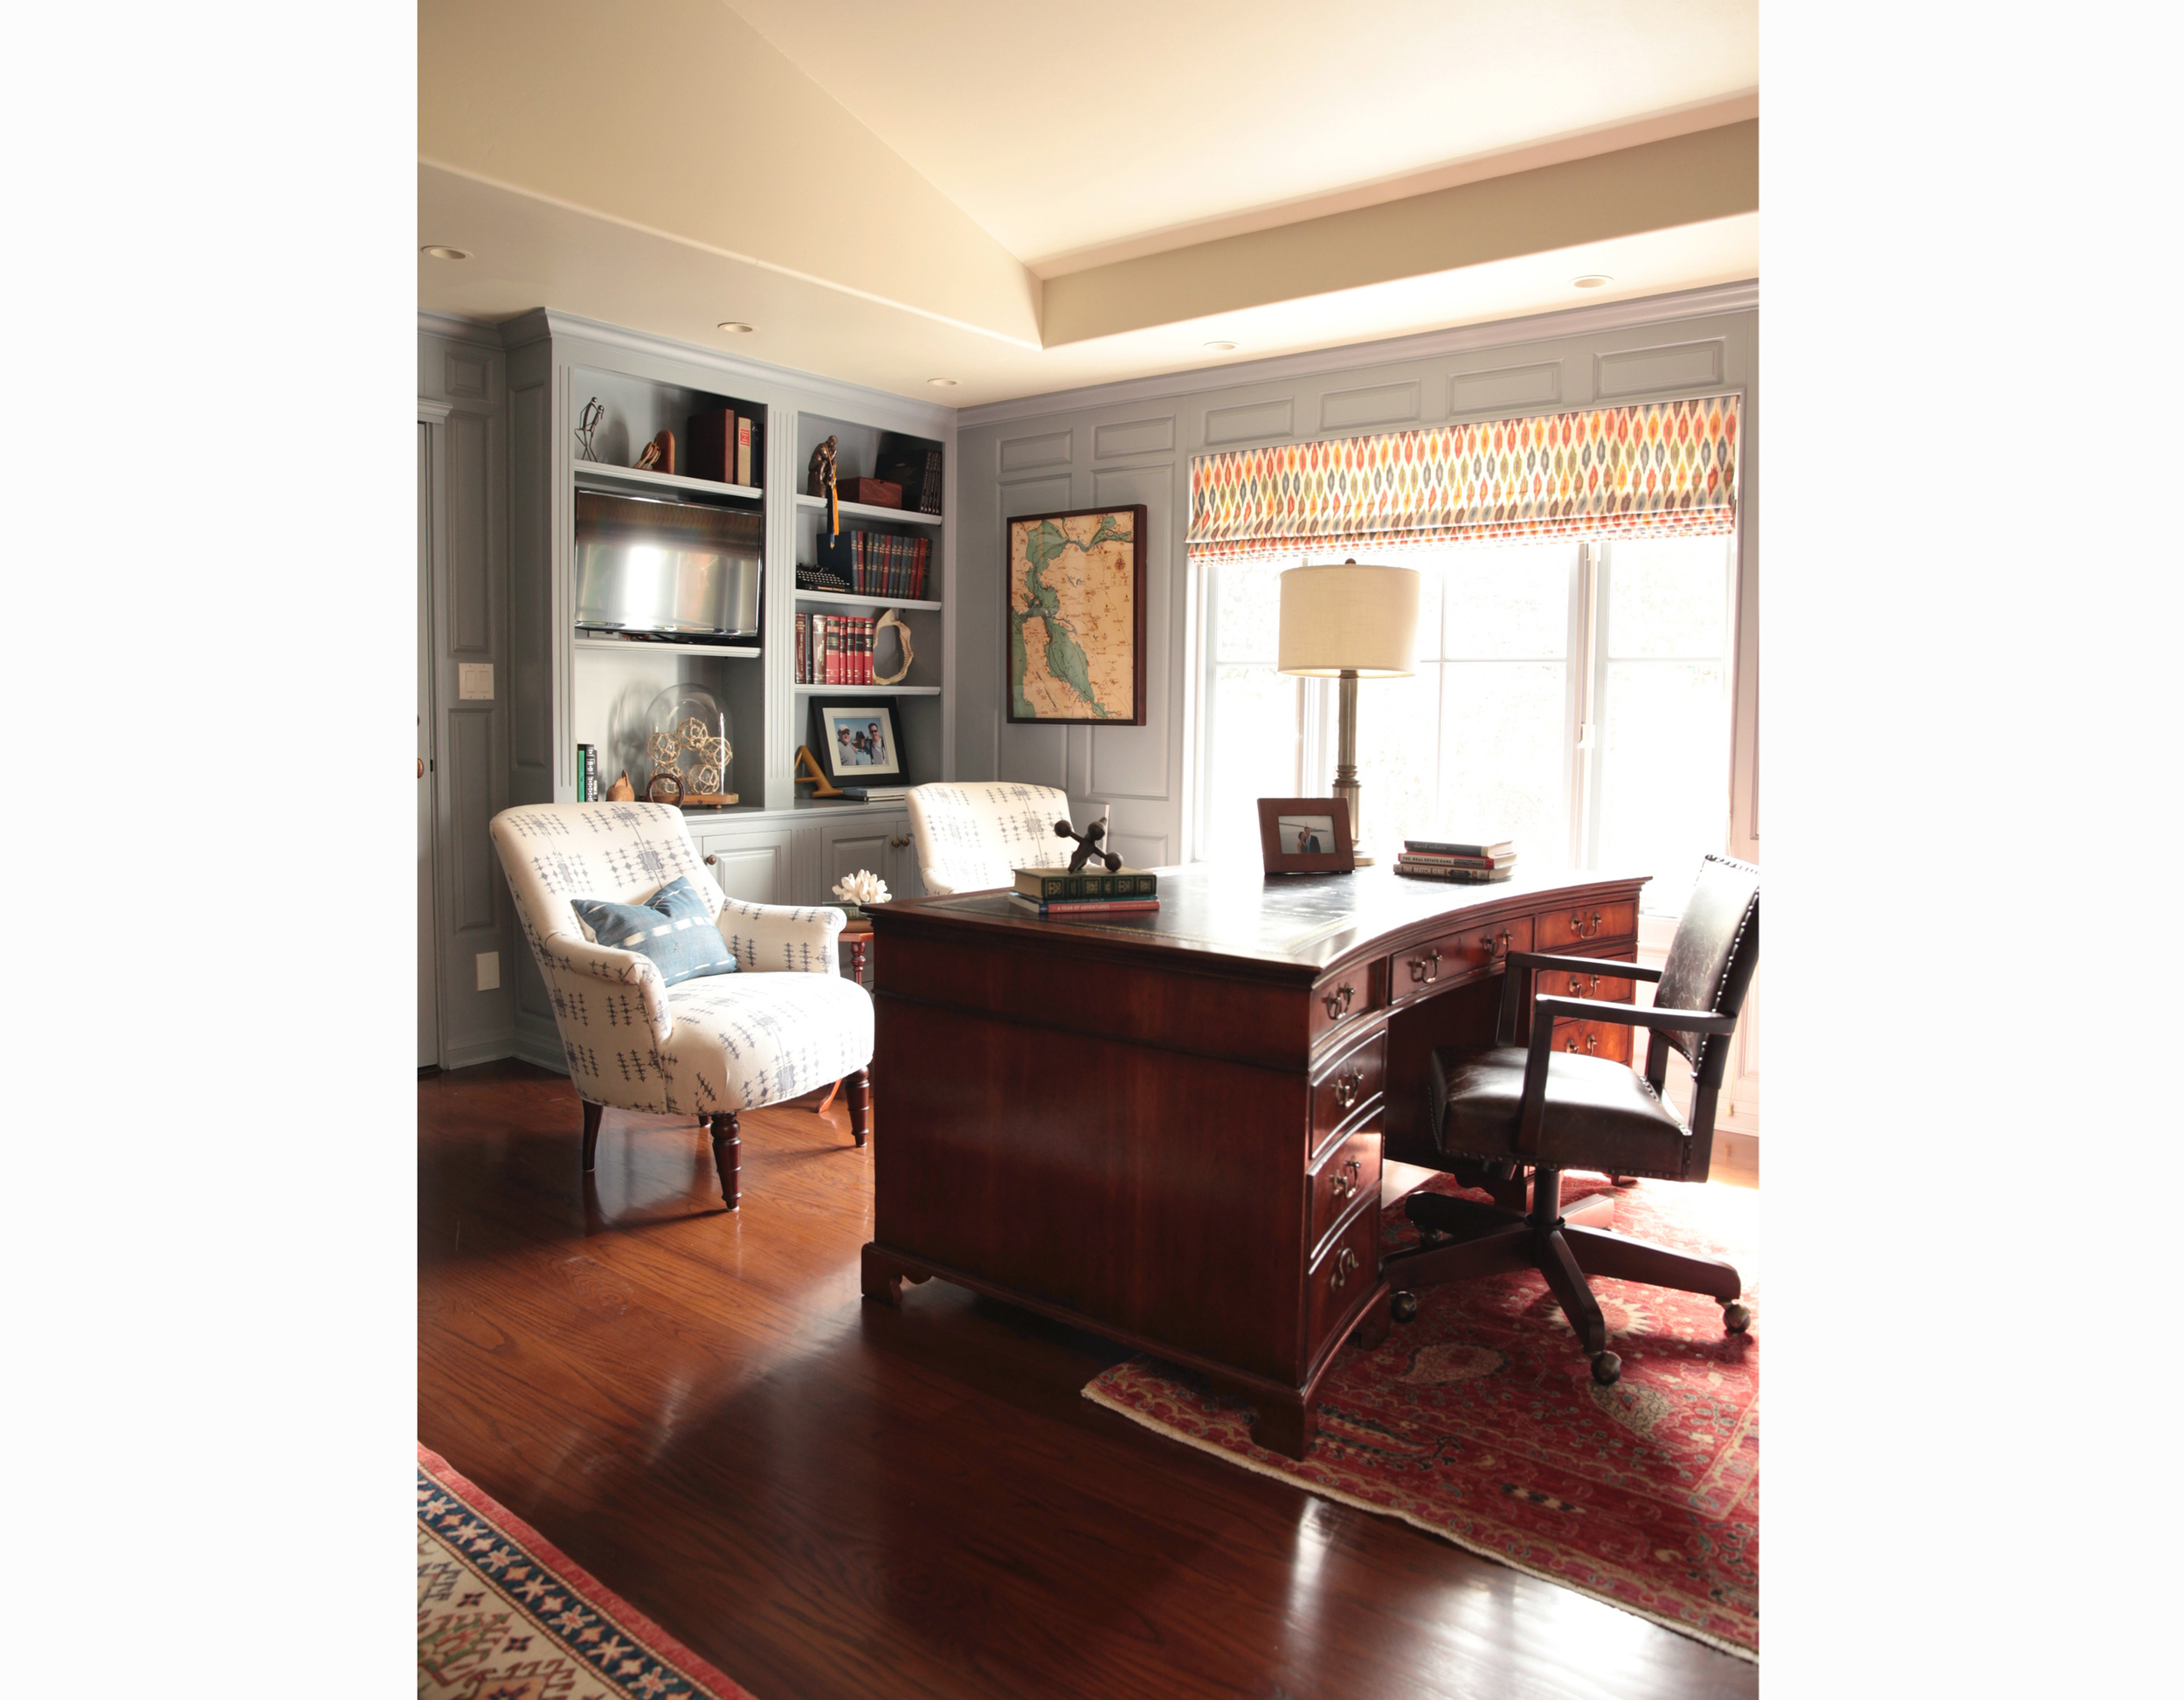 corona del mar vintage eclectic interior design orange county brittany stiles office.jpg